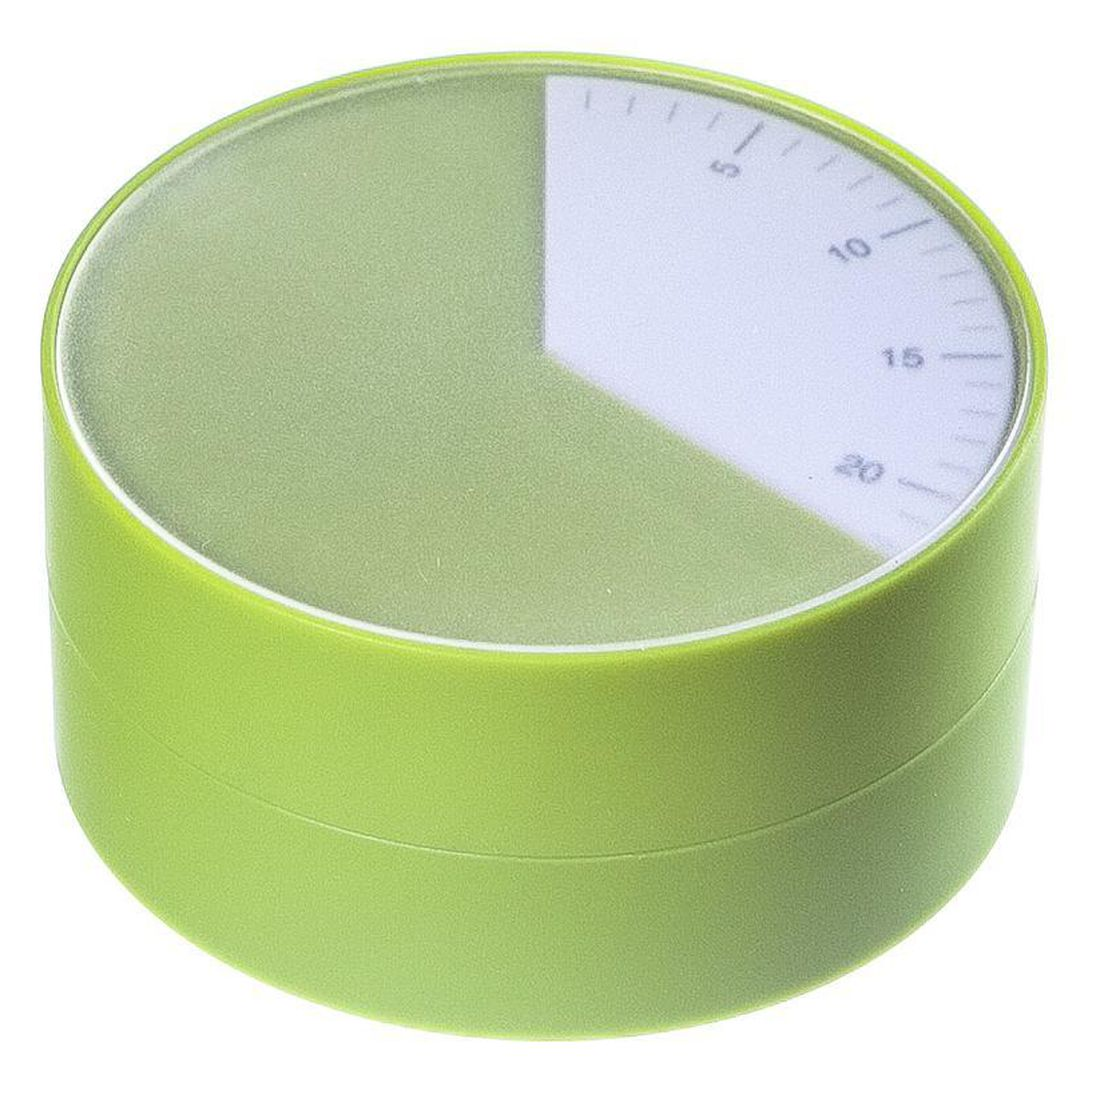 Kurzzeitwecker Pie Timer – Kunststoff – Limegrün, JOSEPH JOSEPH online bestellen